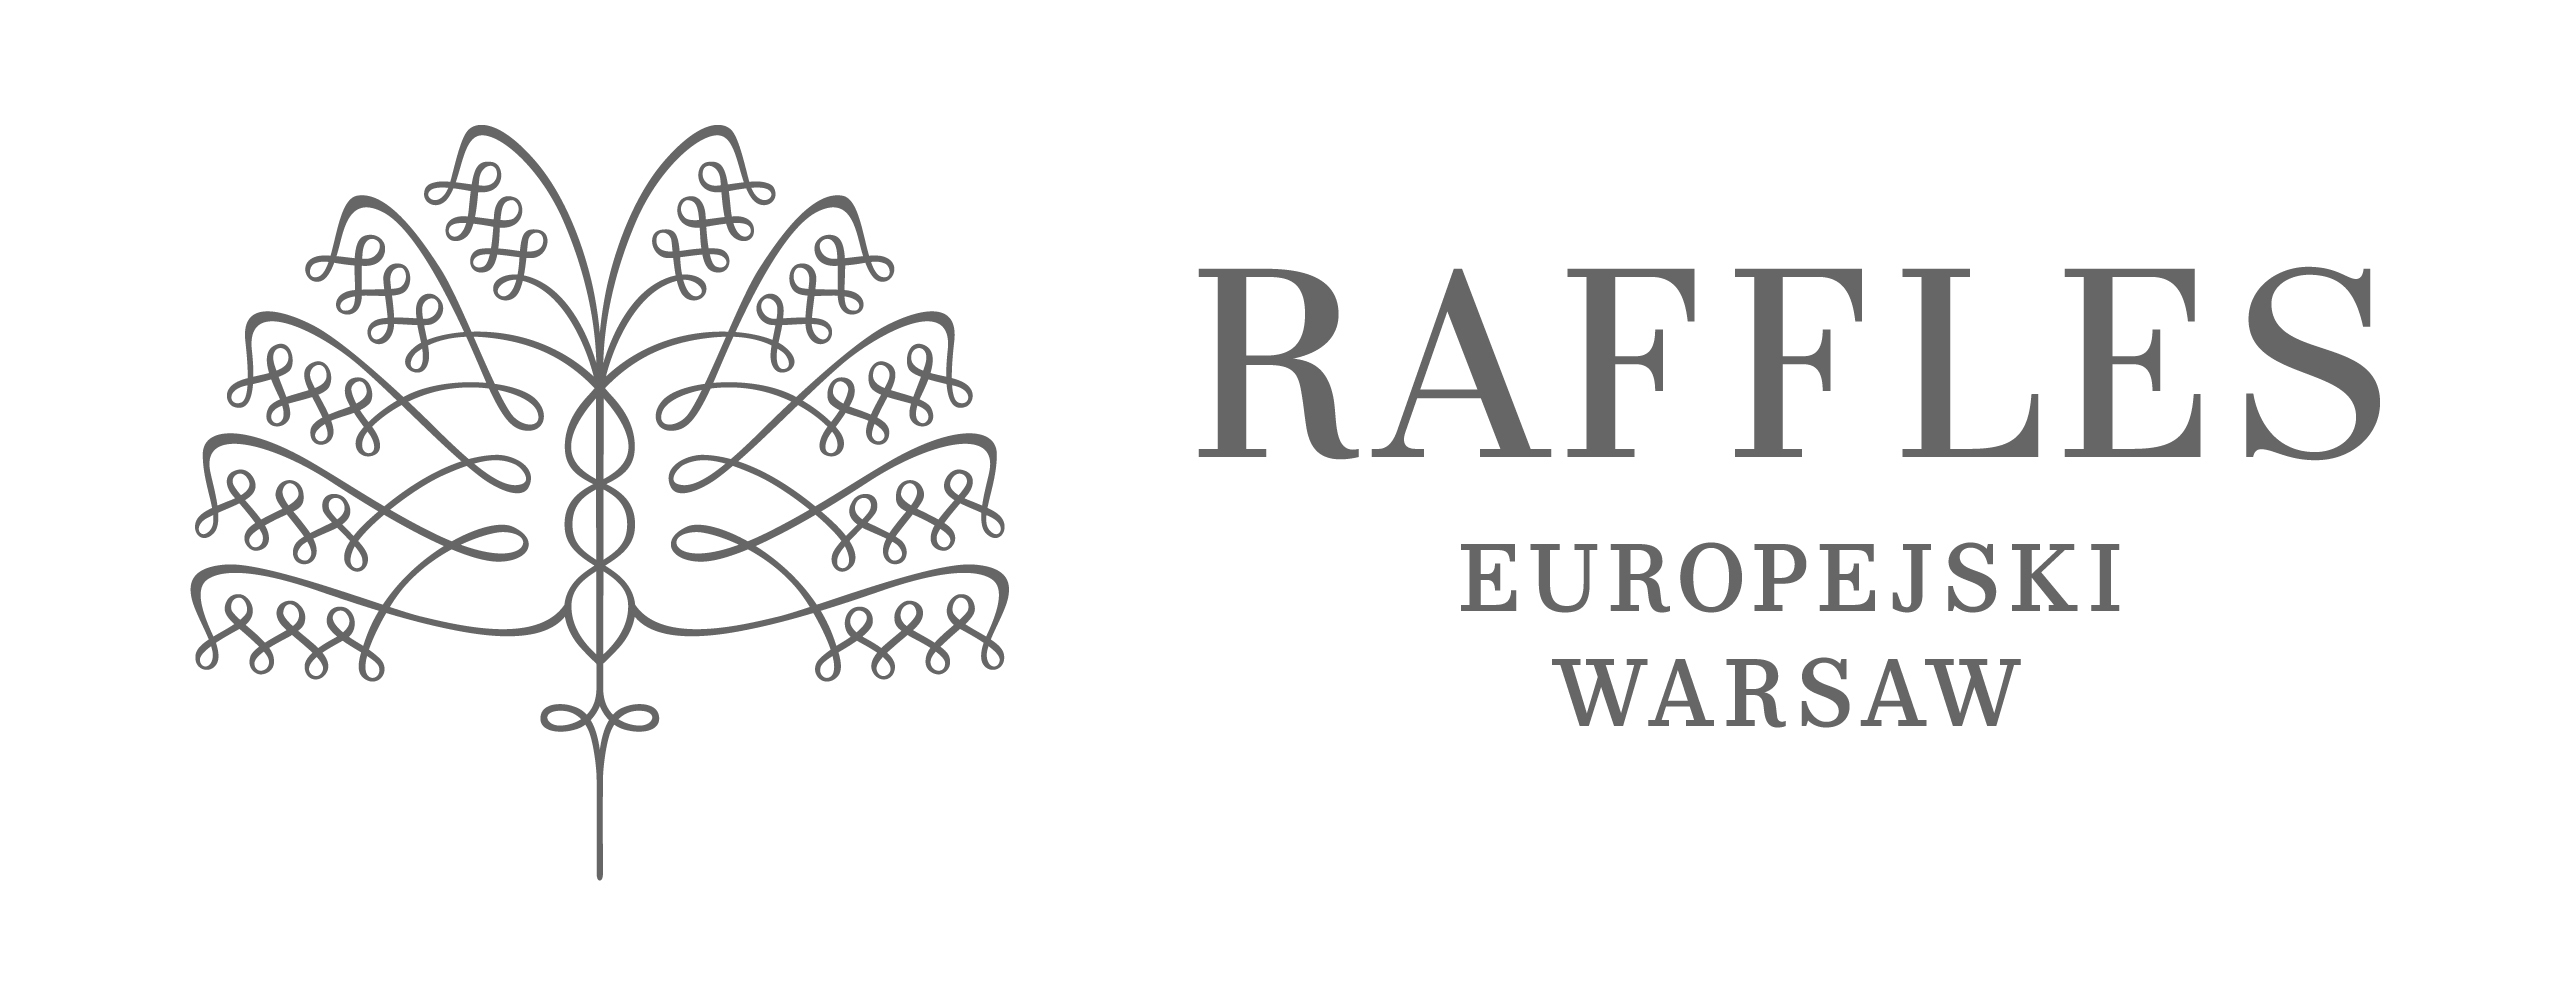 Raffles Europejski Warsaw - 主页